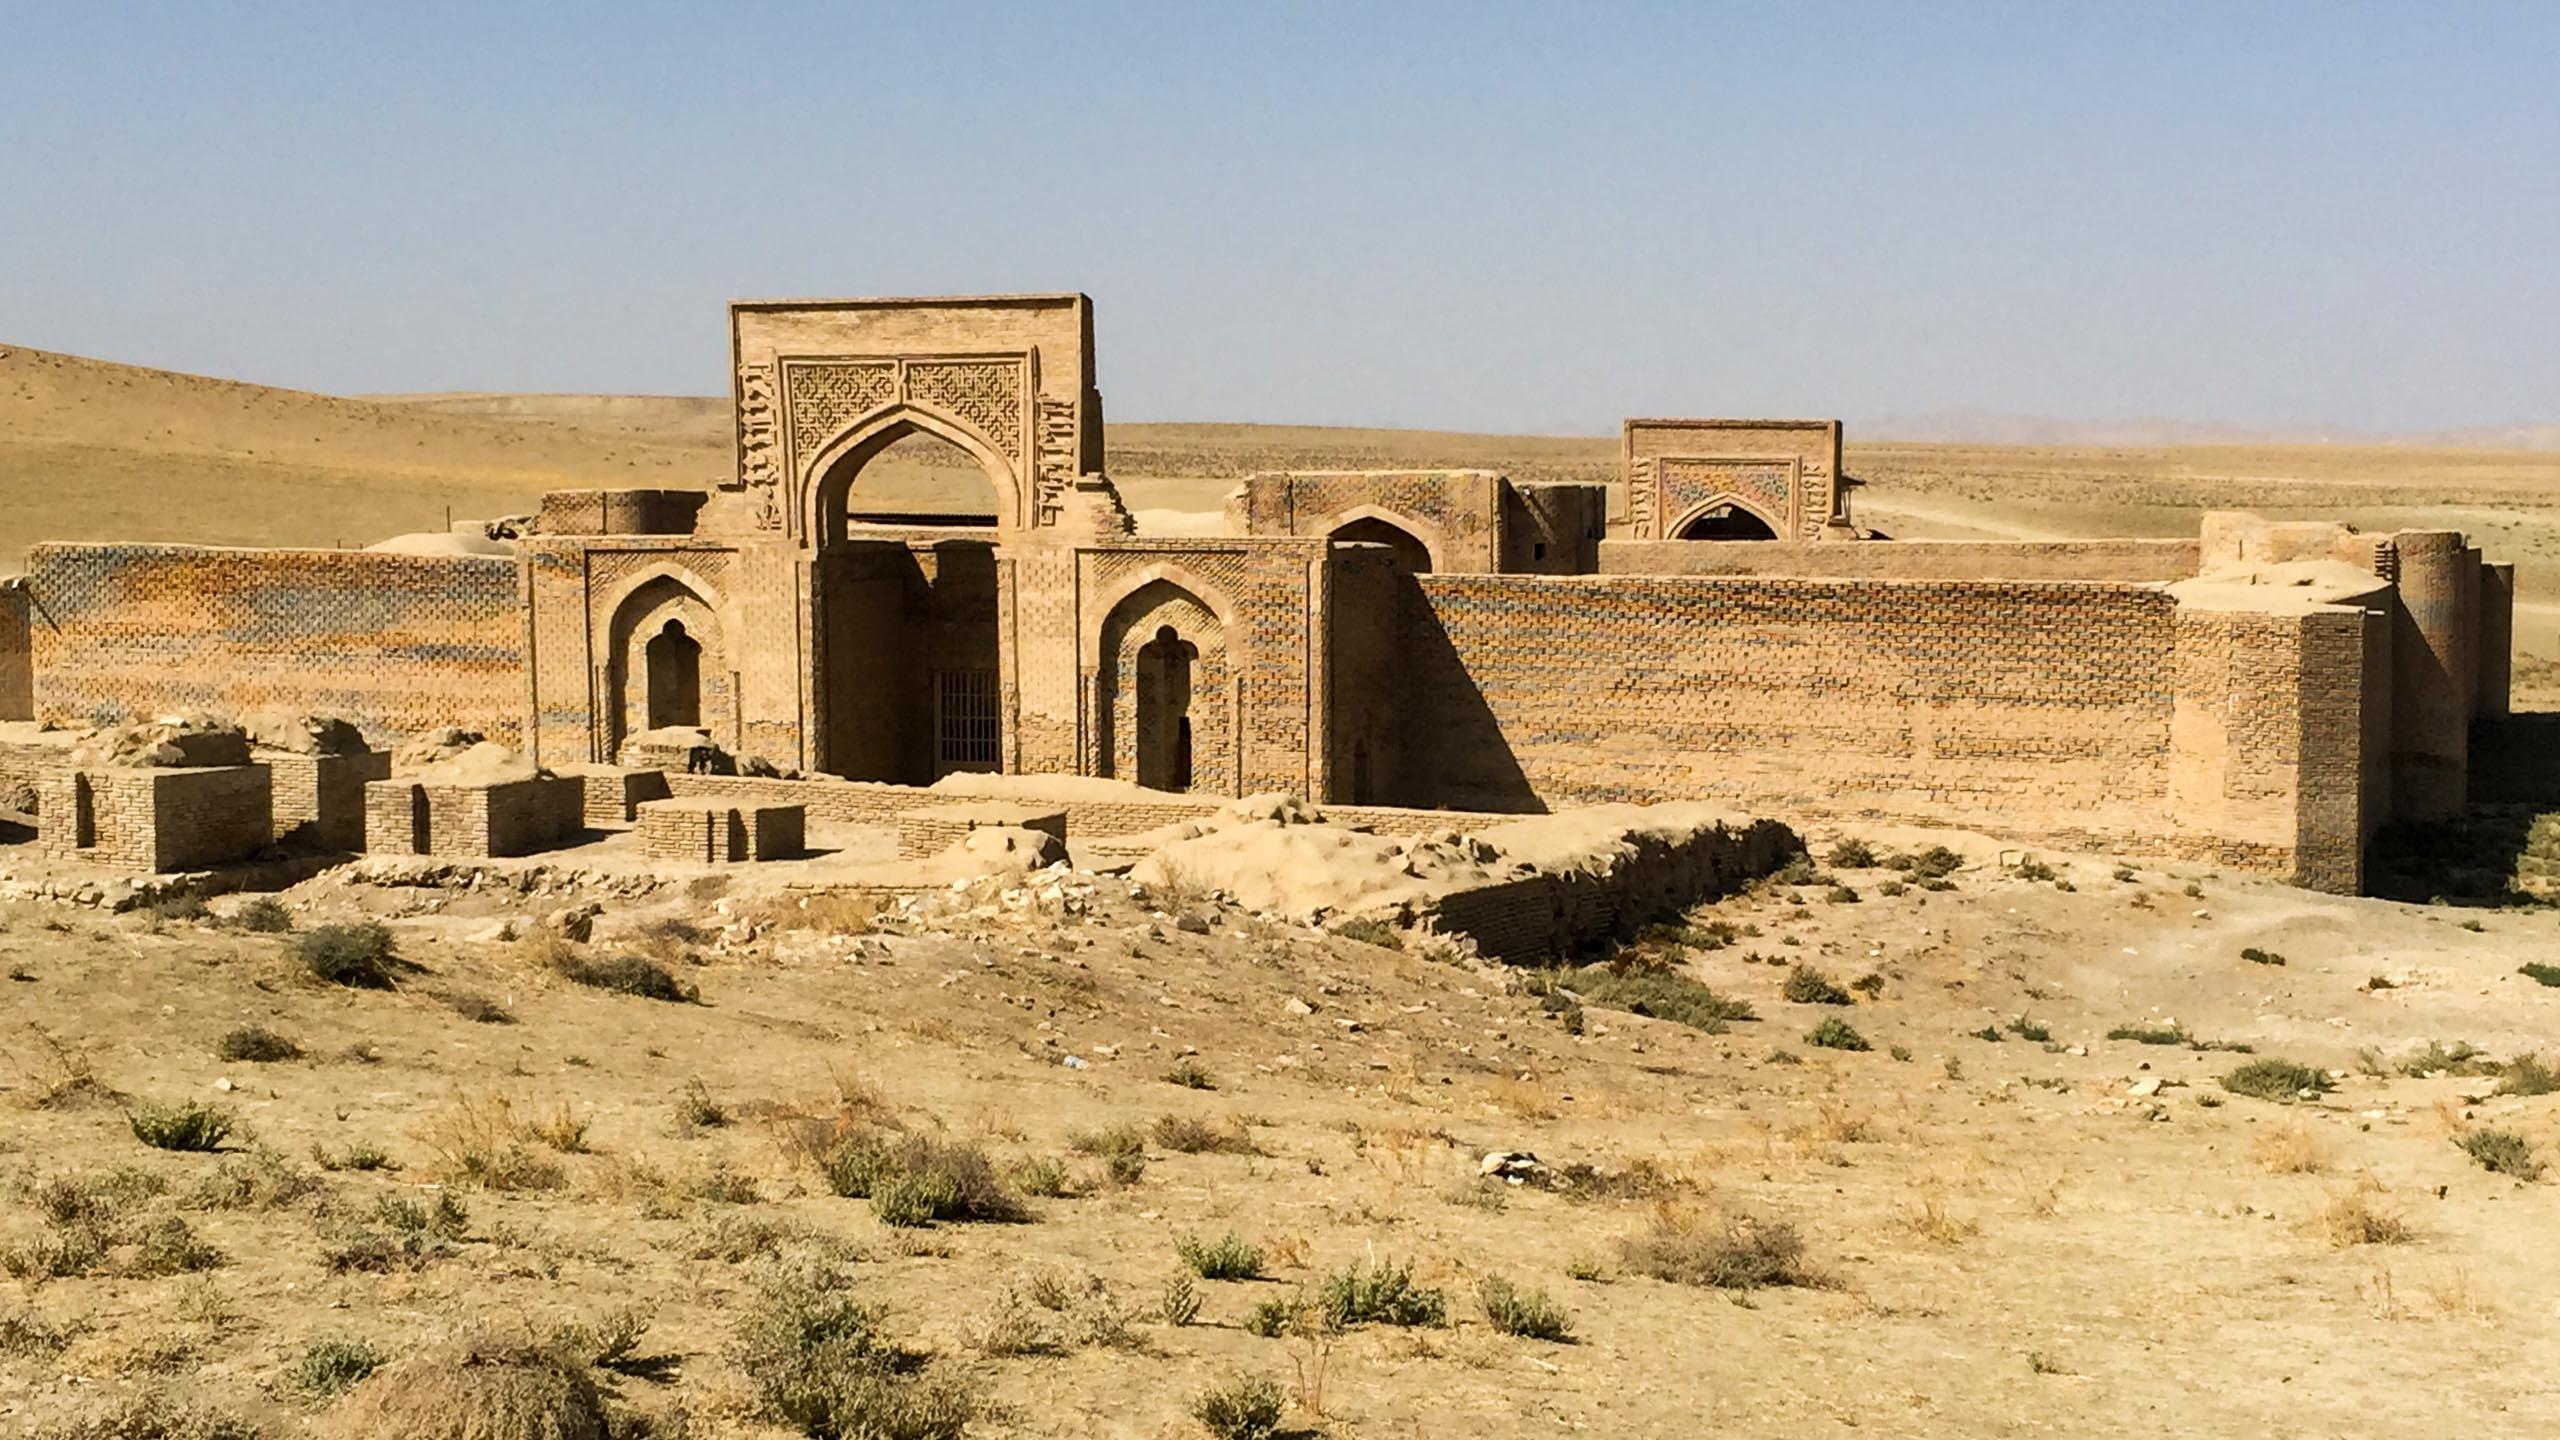 Ruins in Iran desert